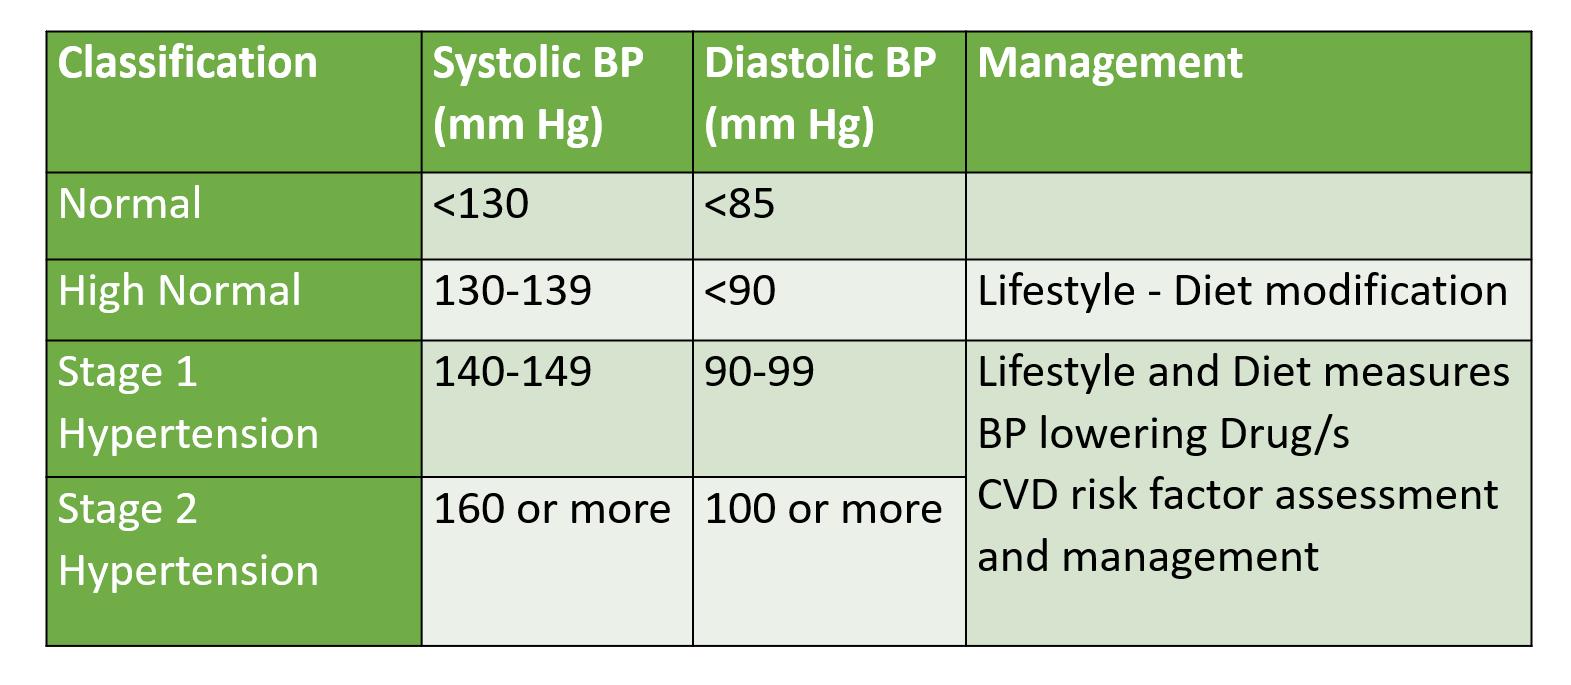 BP classification